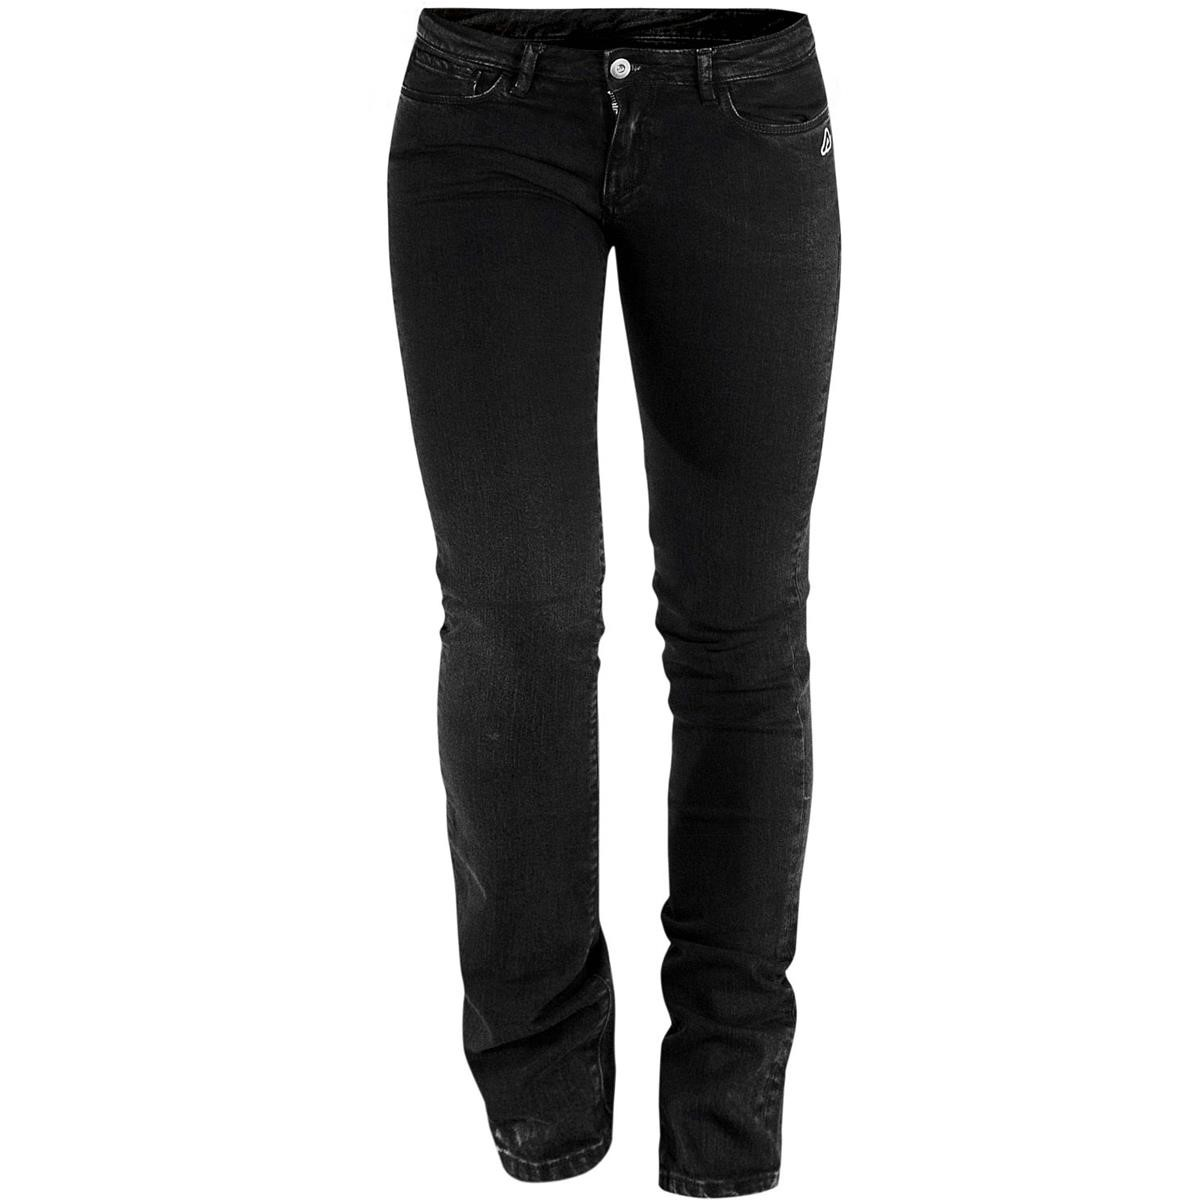 Girls Schwarz Acerbis Girls Acerbis Jeans Corporate 4fnqC7